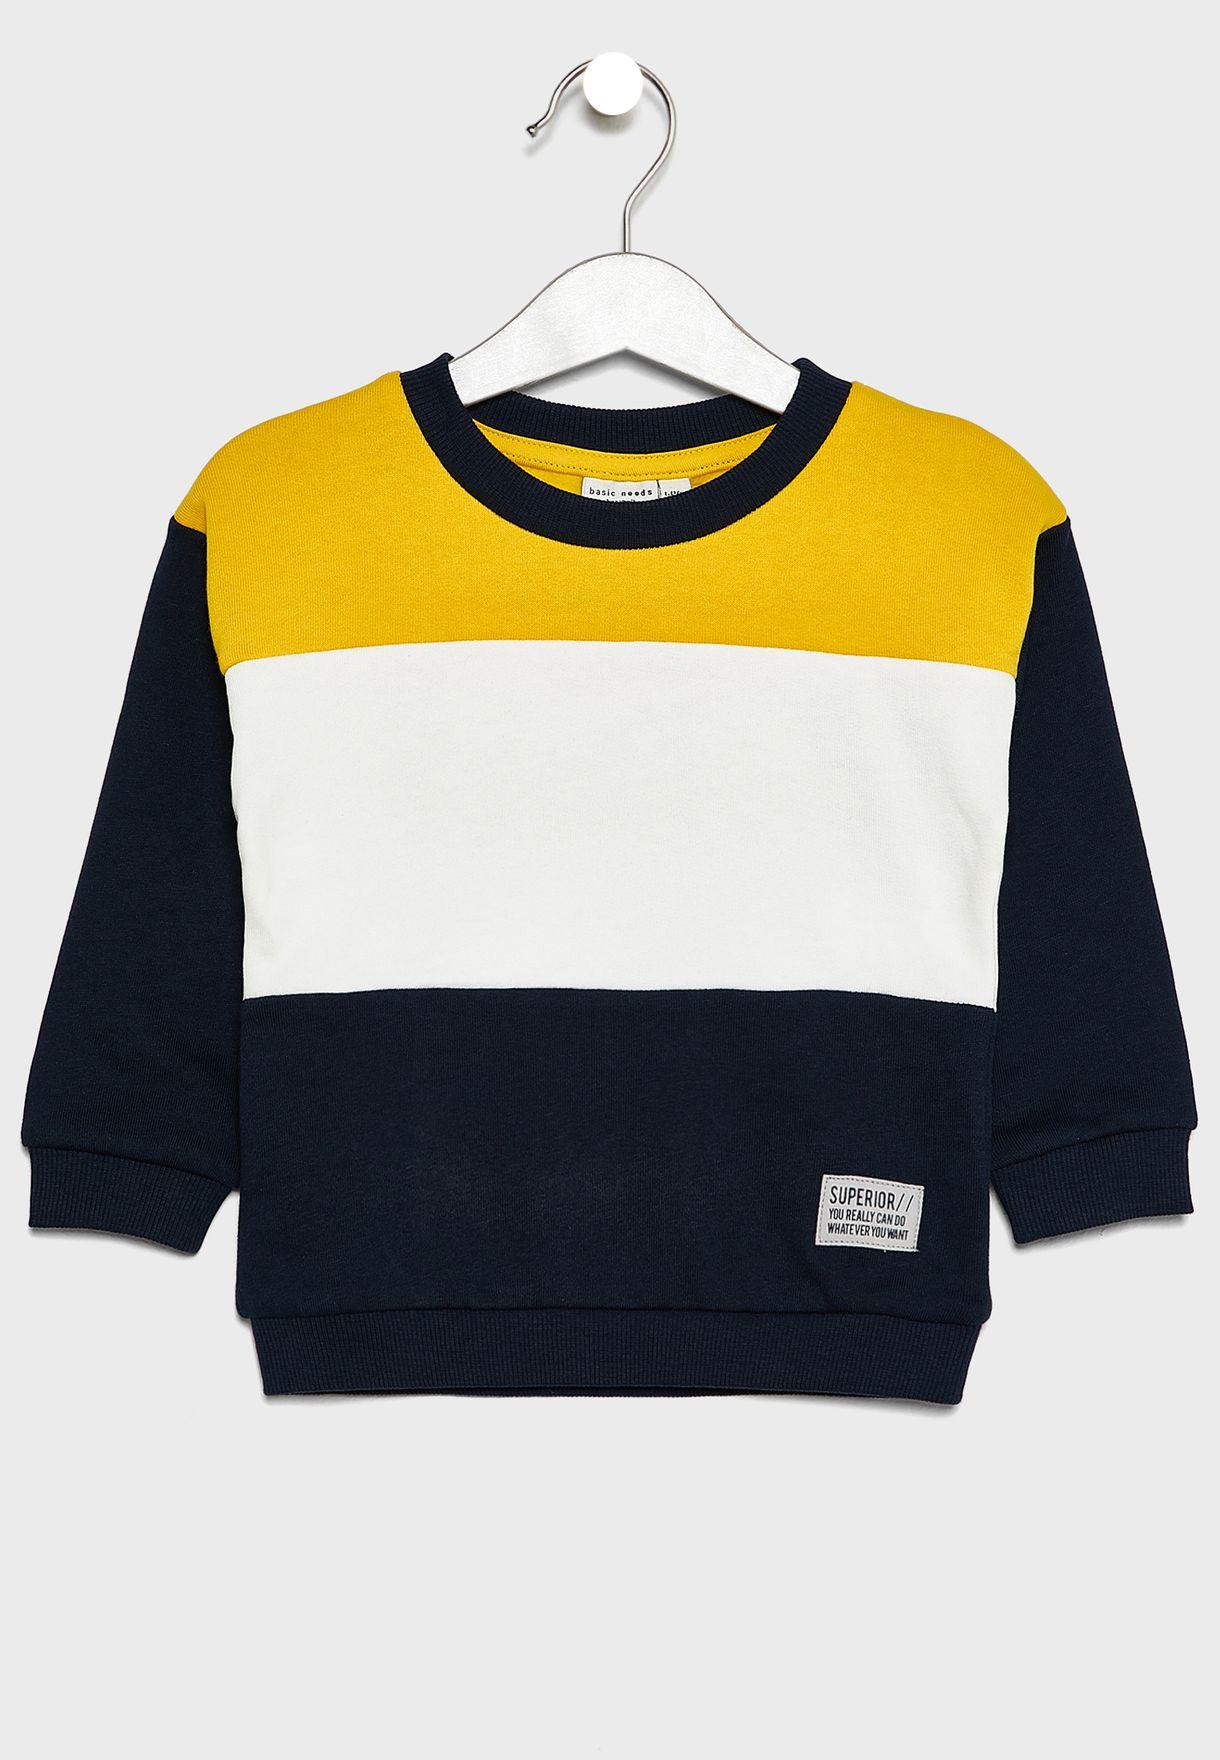 53a0059f13 Kids Color Block Sweatshirt